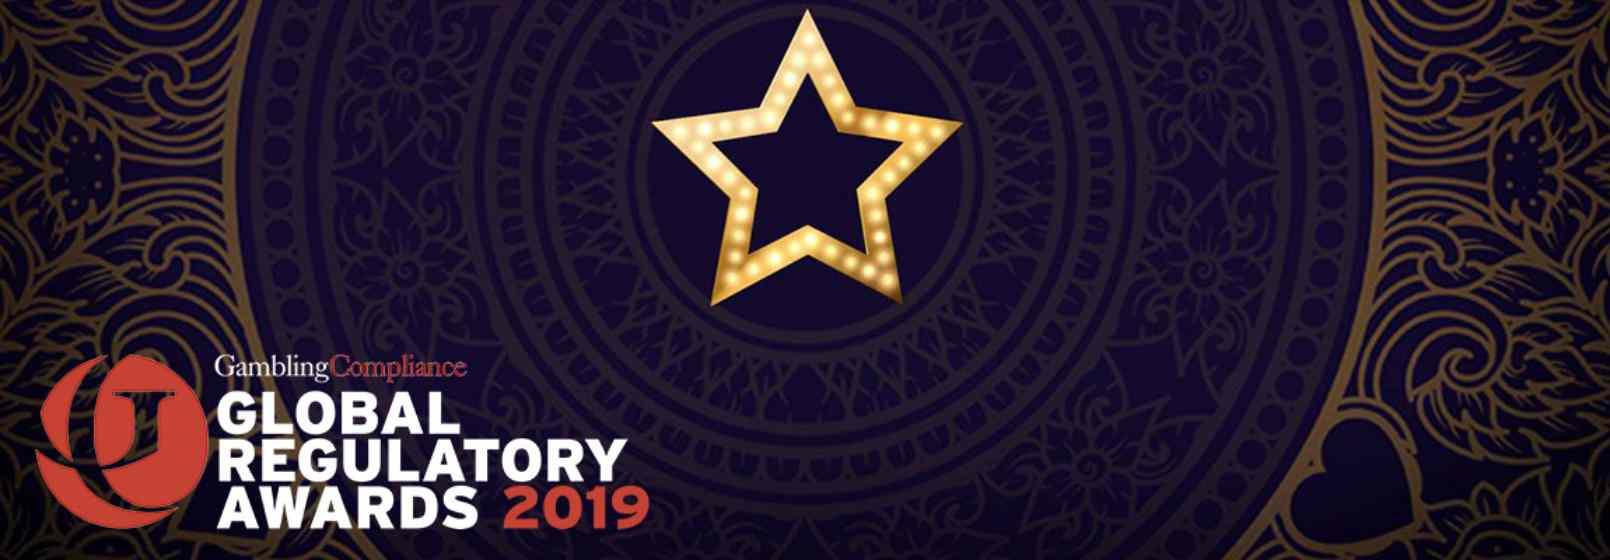 global regulatory awards 2019